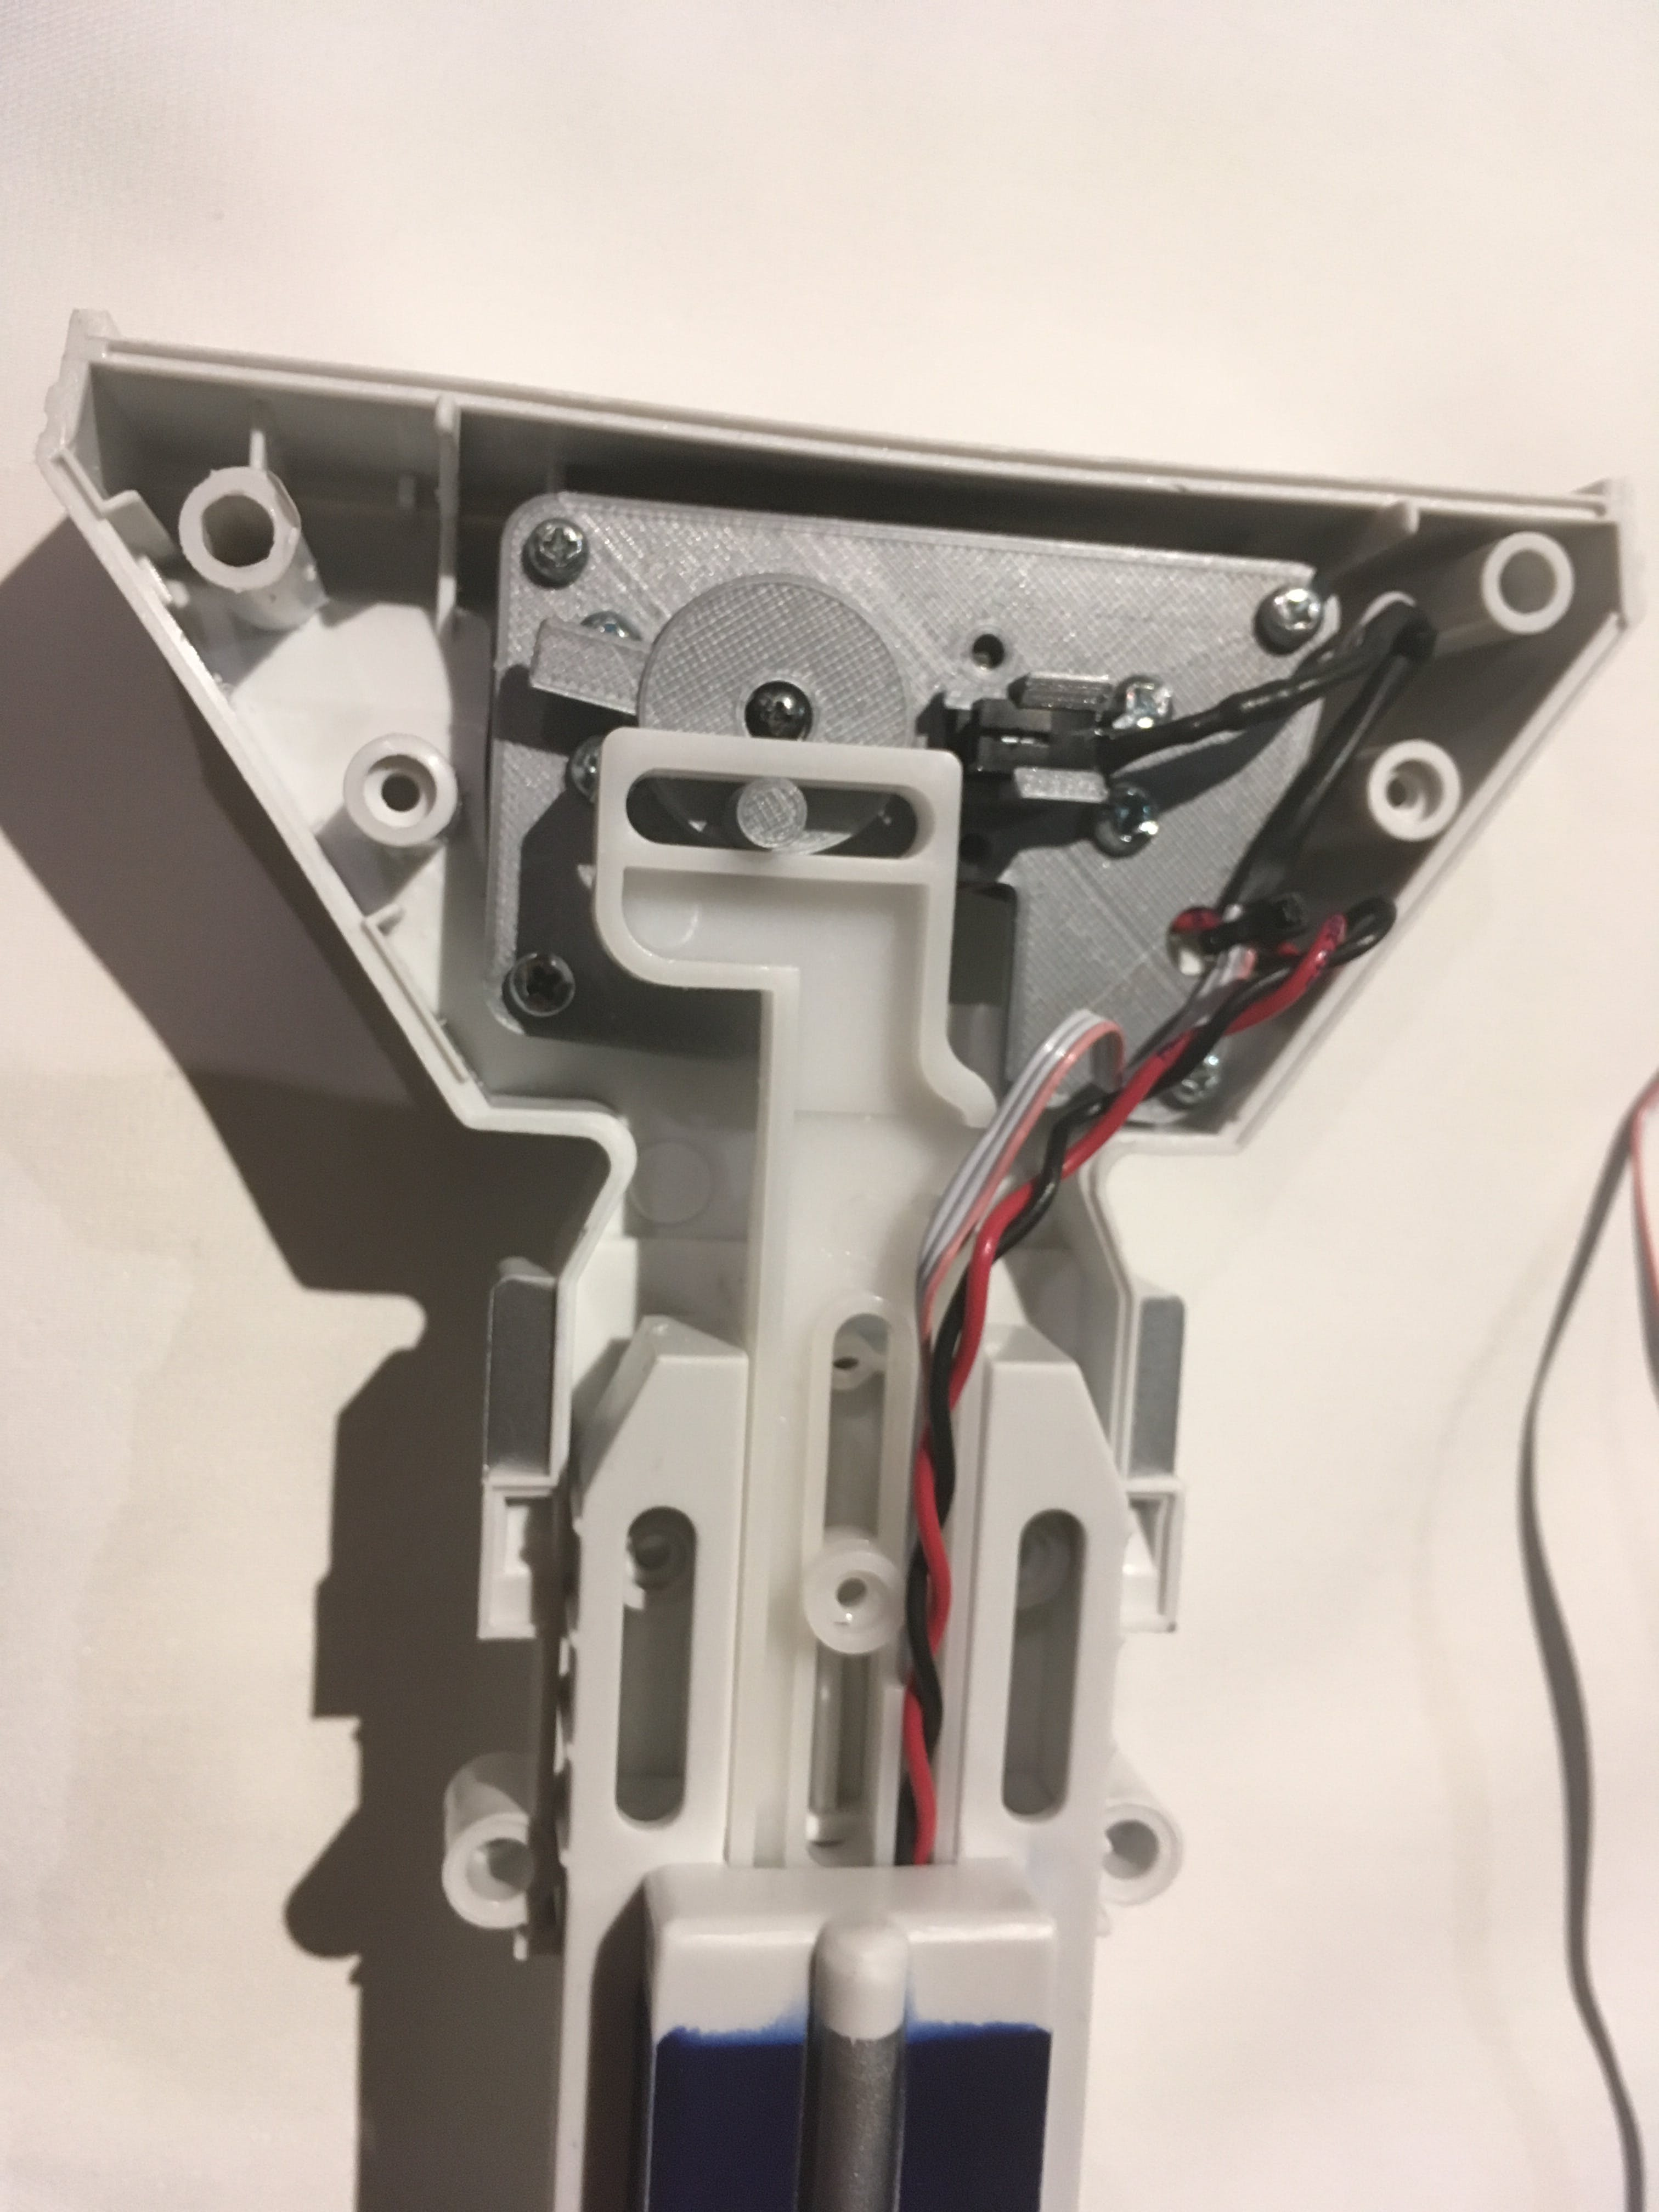 Bottom Leg CAM, Motor and Optical Switch Mount